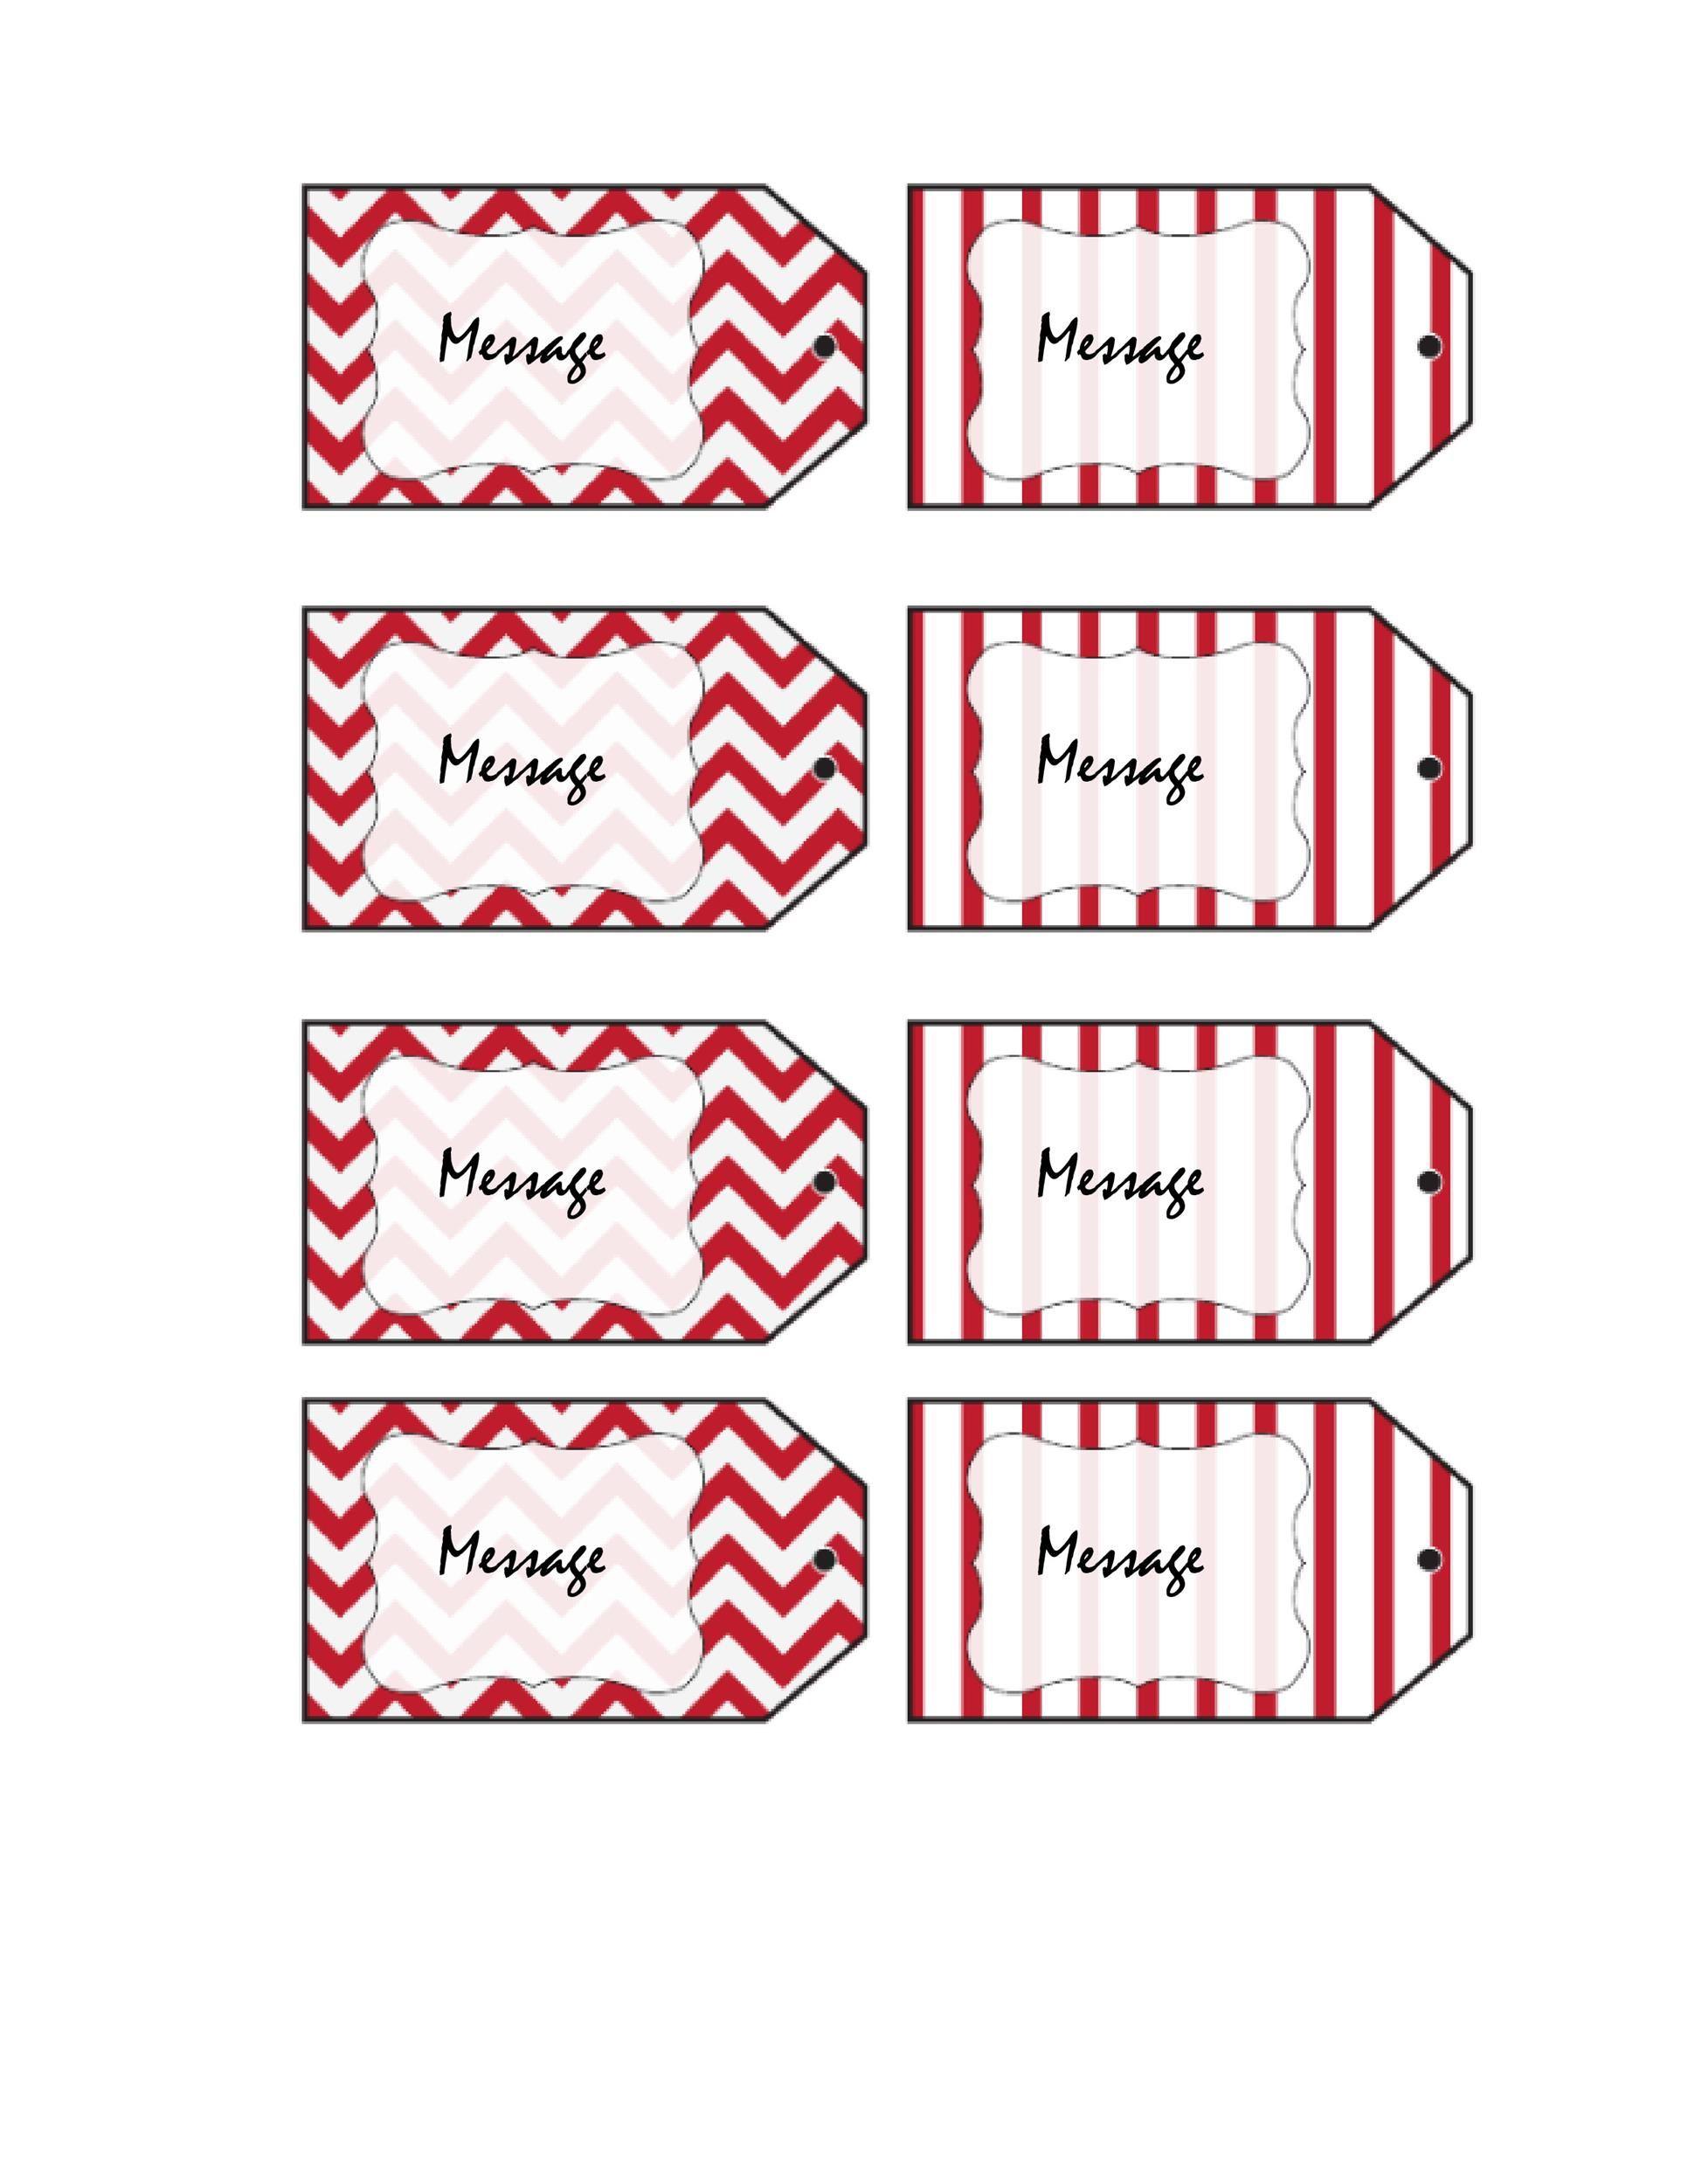 004 Sensational Free Gift Tag Template Idea  Templates Downloadable Christma Printable For Word To PrintFull